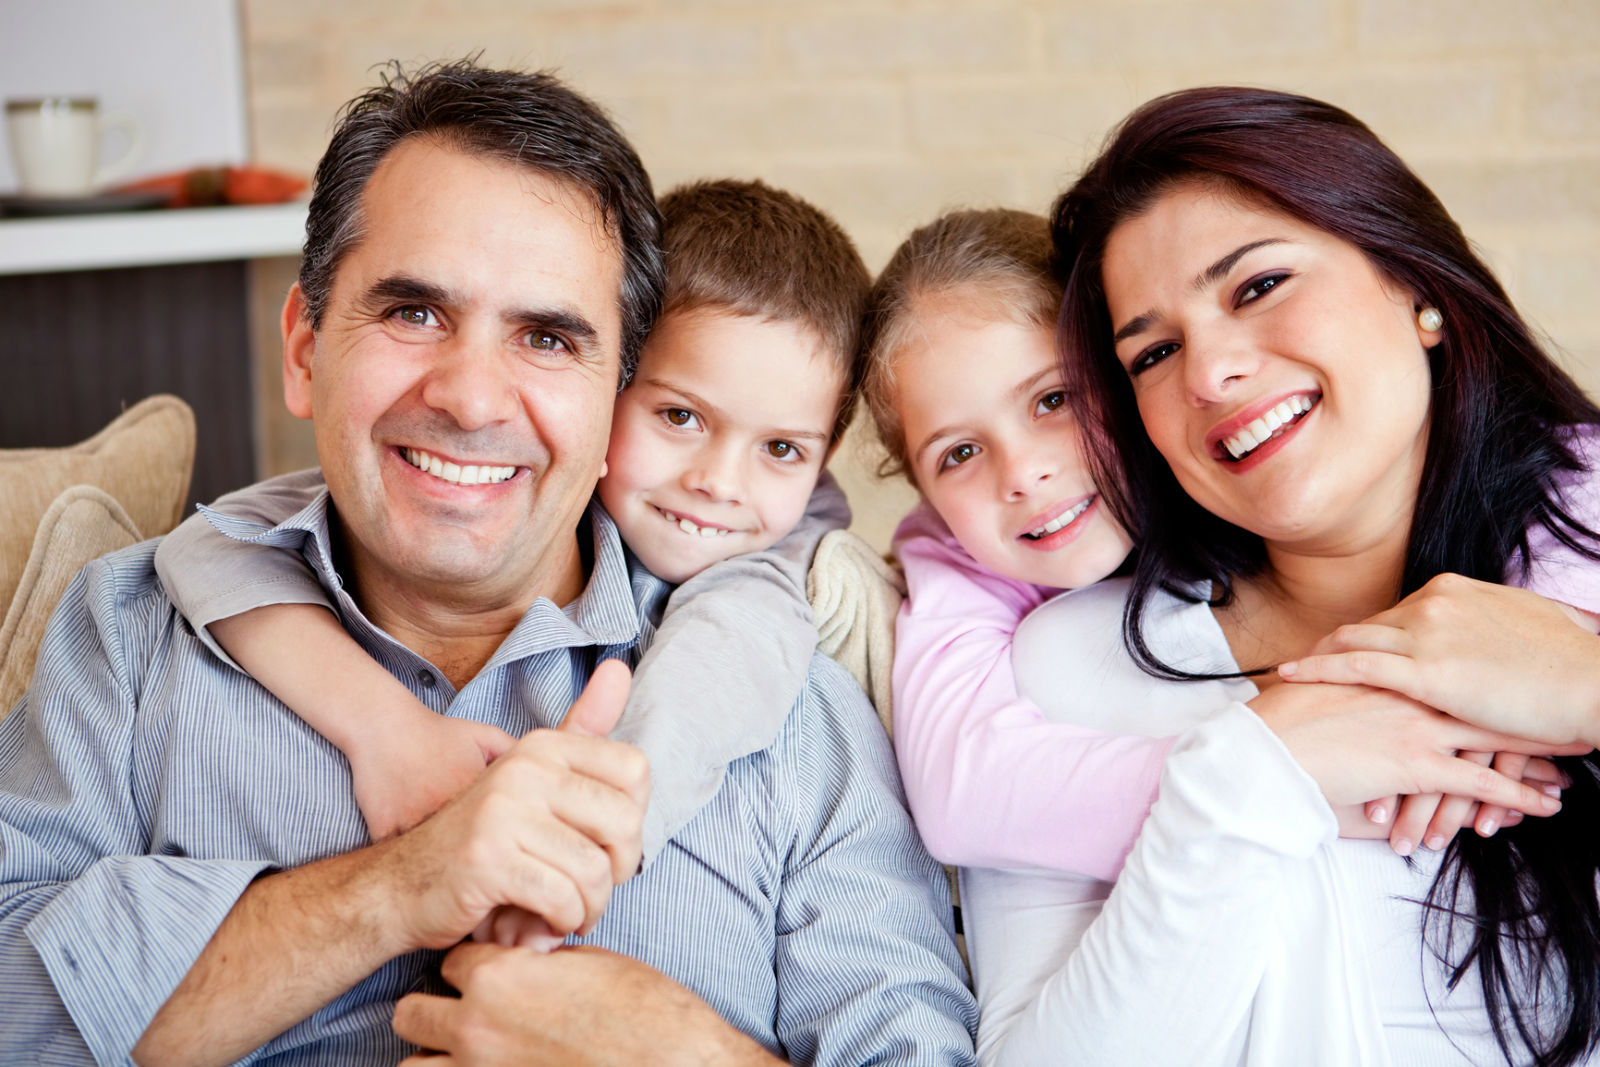 001-familia-feliz2-2